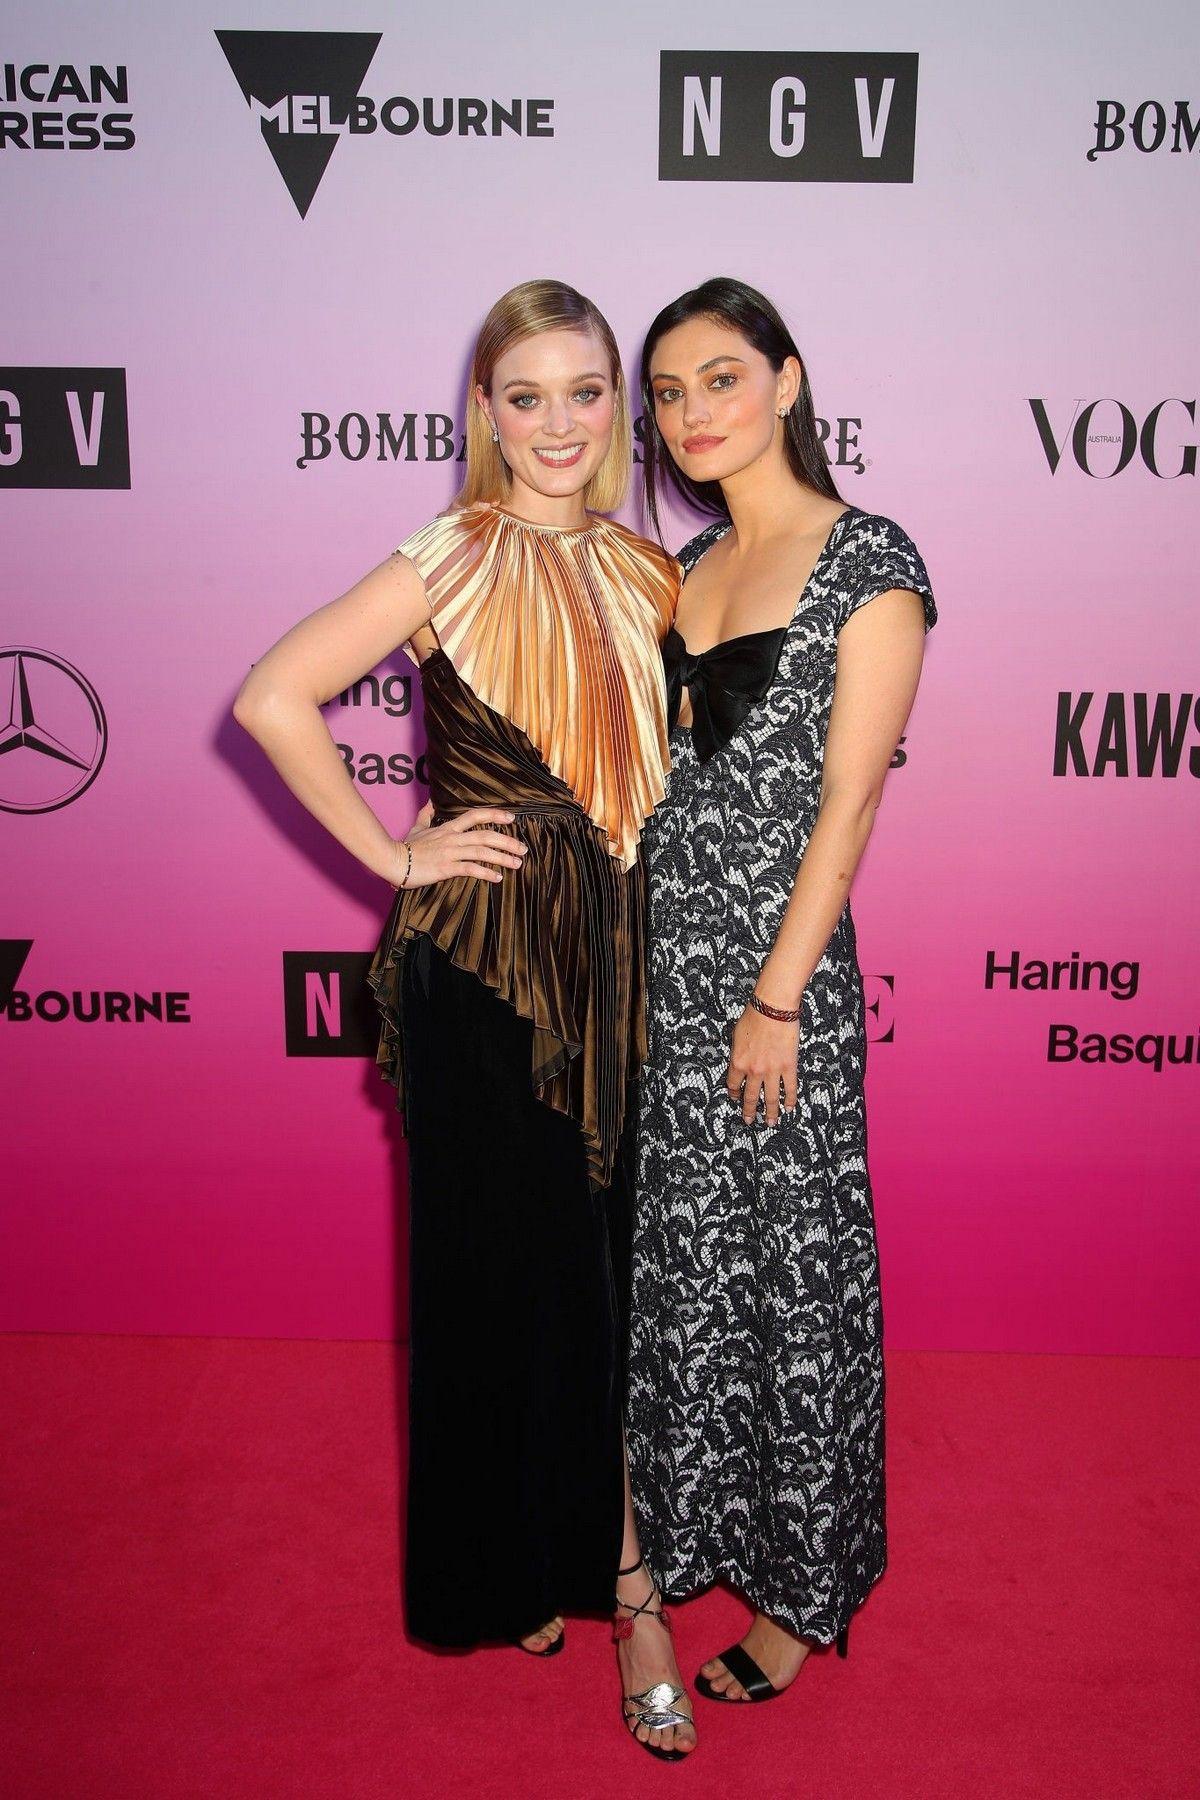 Phoebe Tonkin And Bella Heathcote Attends Ngv Gala In Melbourne Australia 2019 11 30 Phoebe Tonkin Gala Hollywood Celebrities